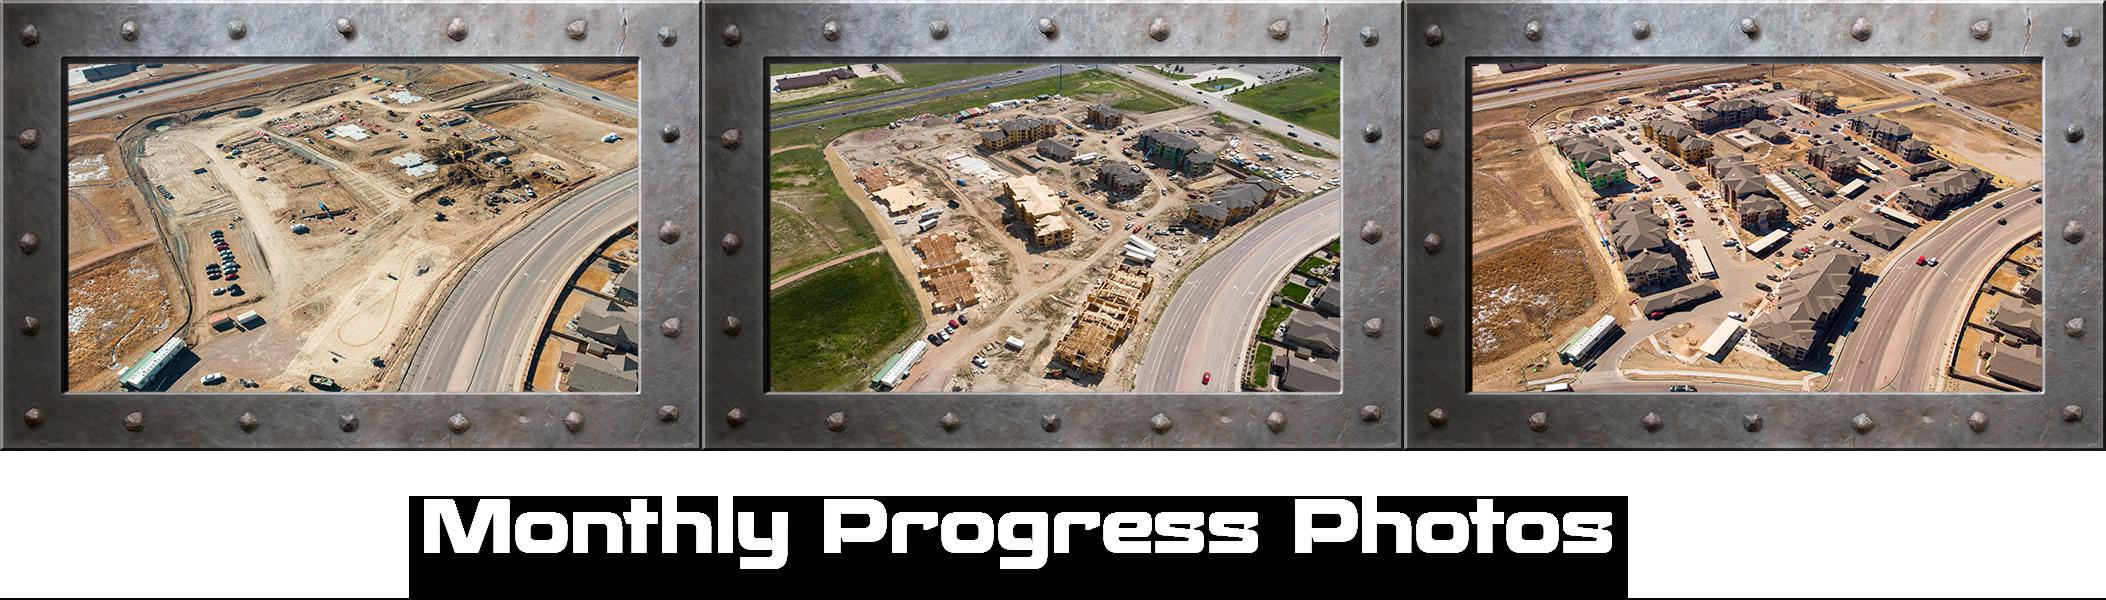 Construction Progress Graphic V2